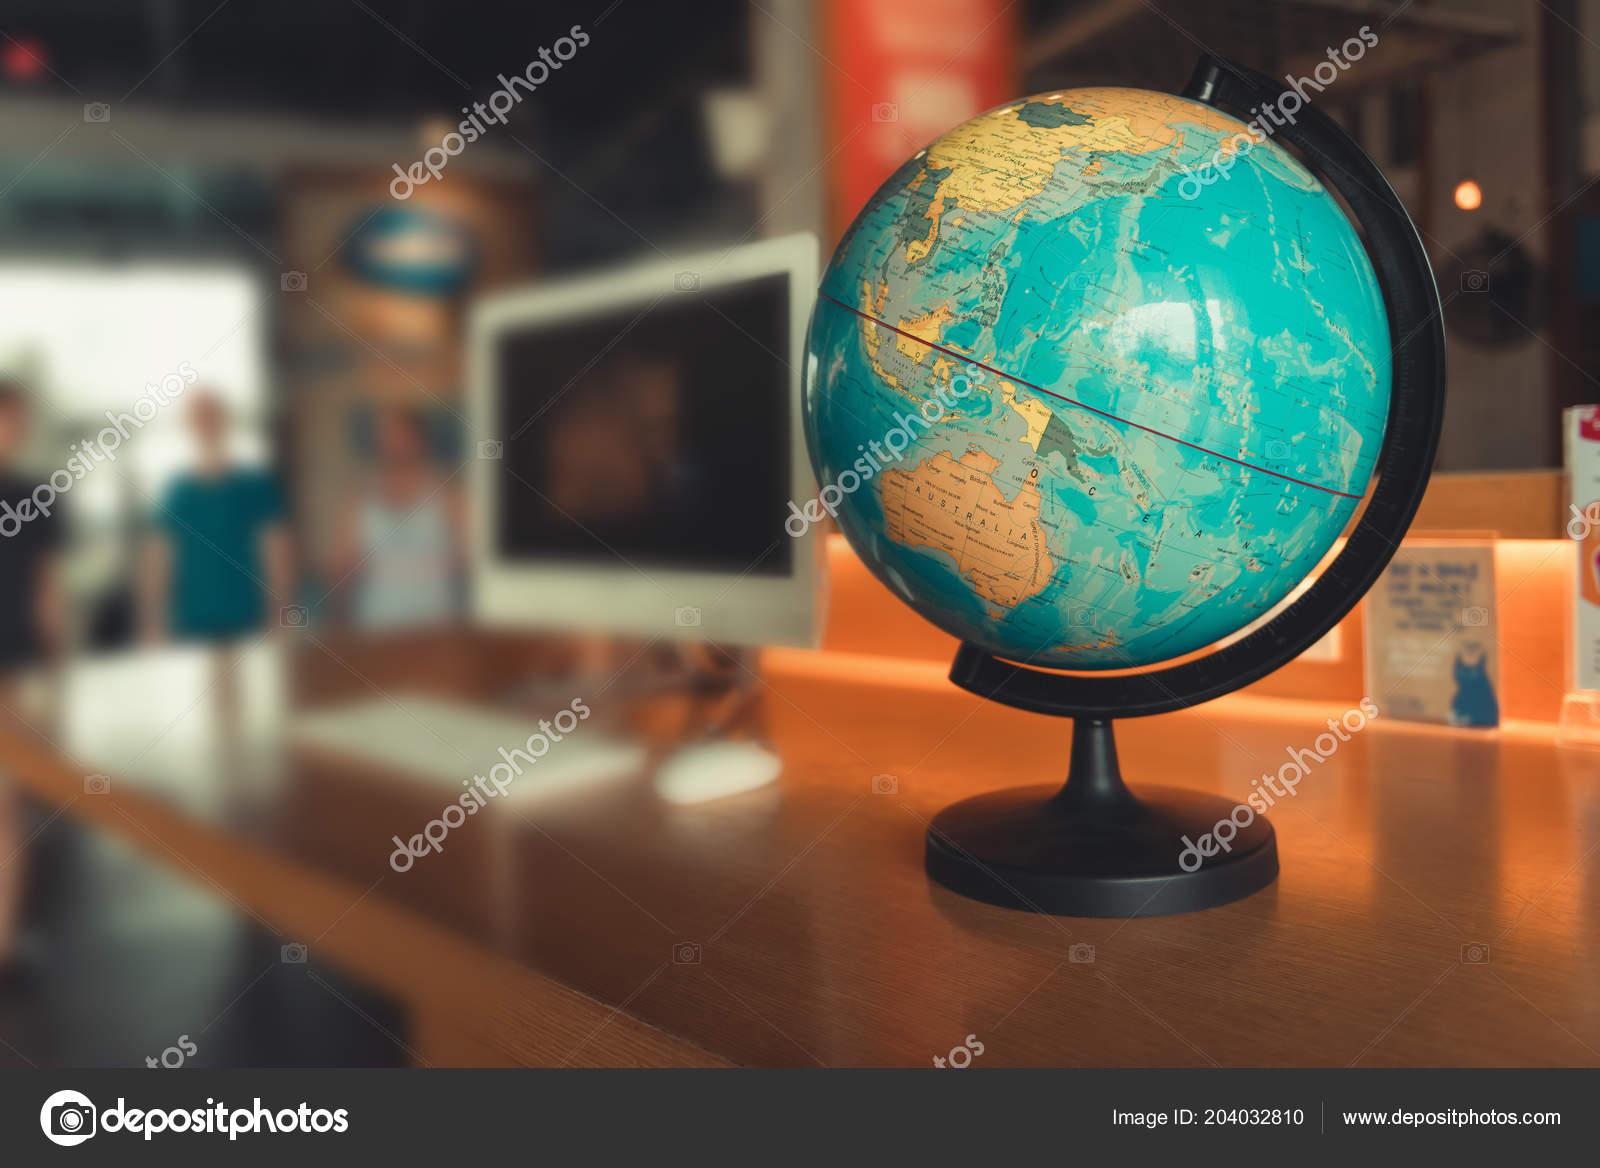 Globe World Map Computer Desktop World Travel Explore Destination Concept Stock Photo Image By C K D P 204032810